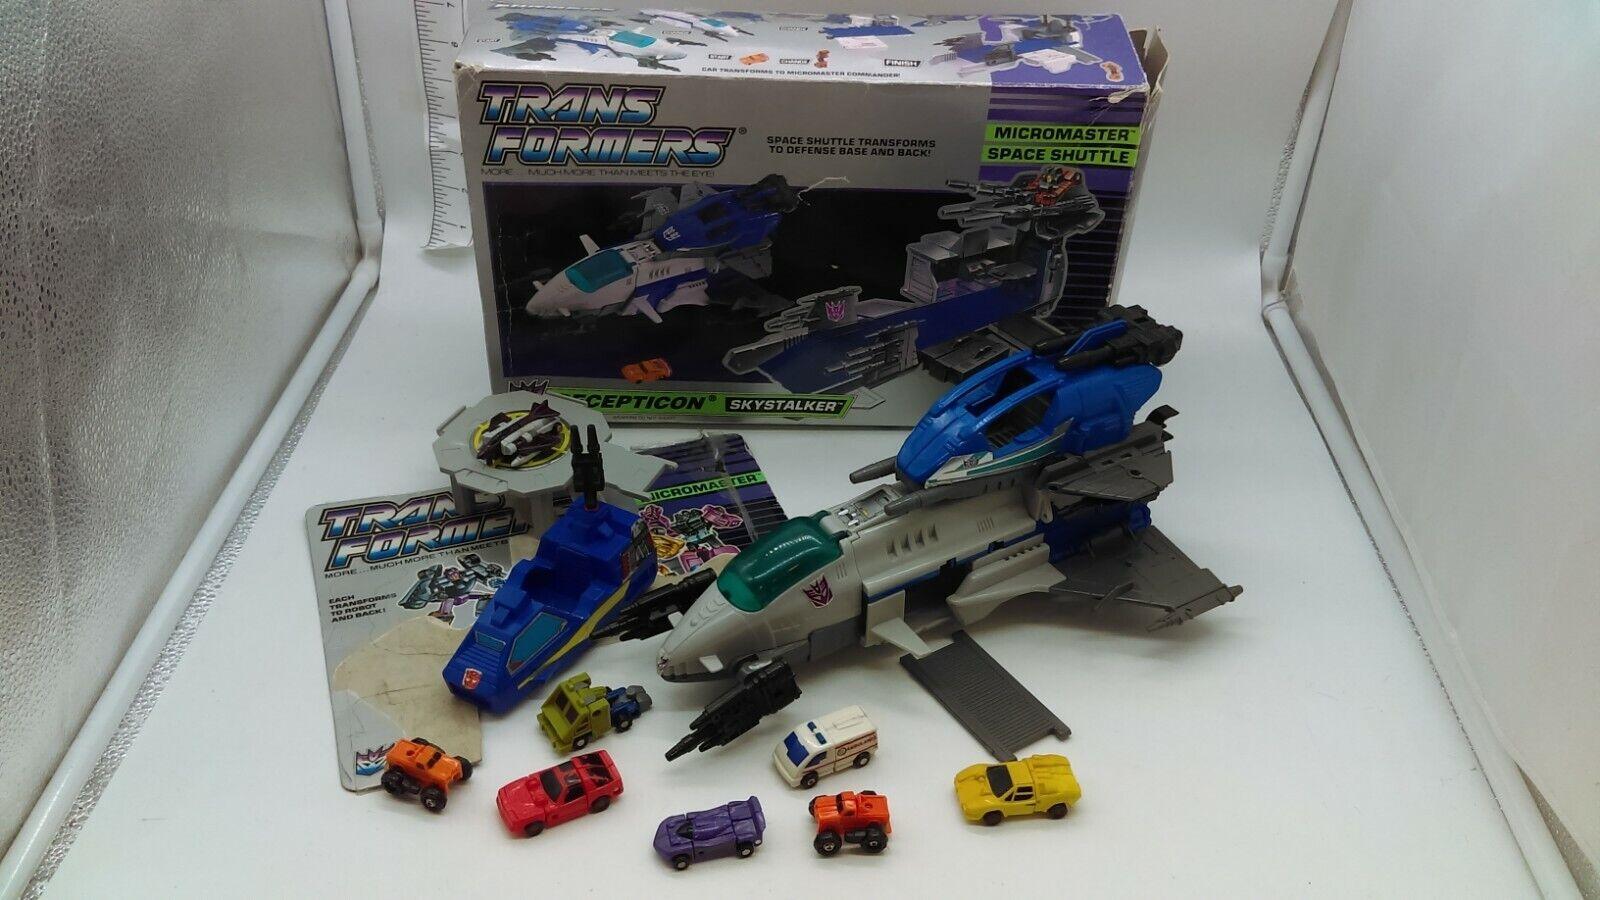 Vintage 1989 Hasbro G1 Transformers Micromaster Skystalker W Box & more lot KO 's